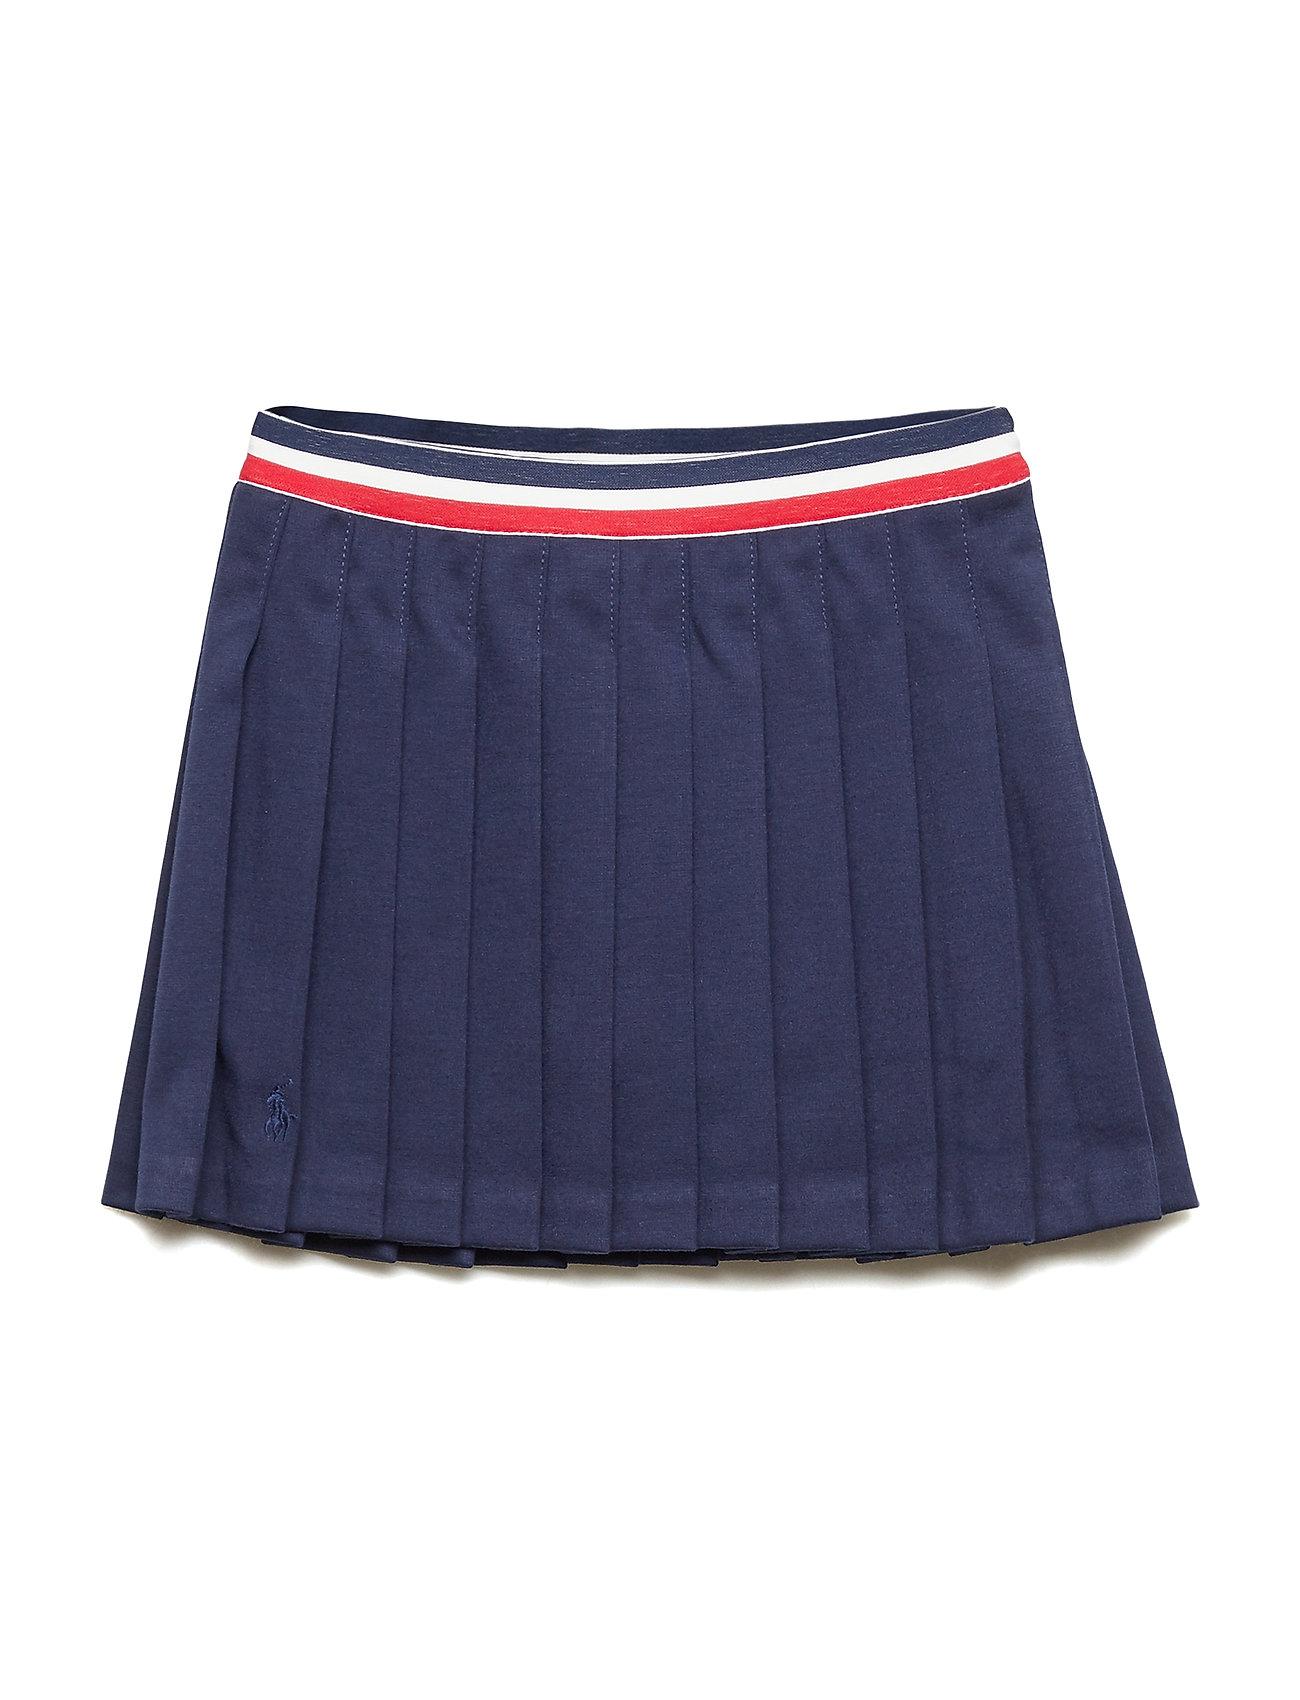 Ralph Lauren Kids Pleated Ponte Skirt - FRENCH NAVY